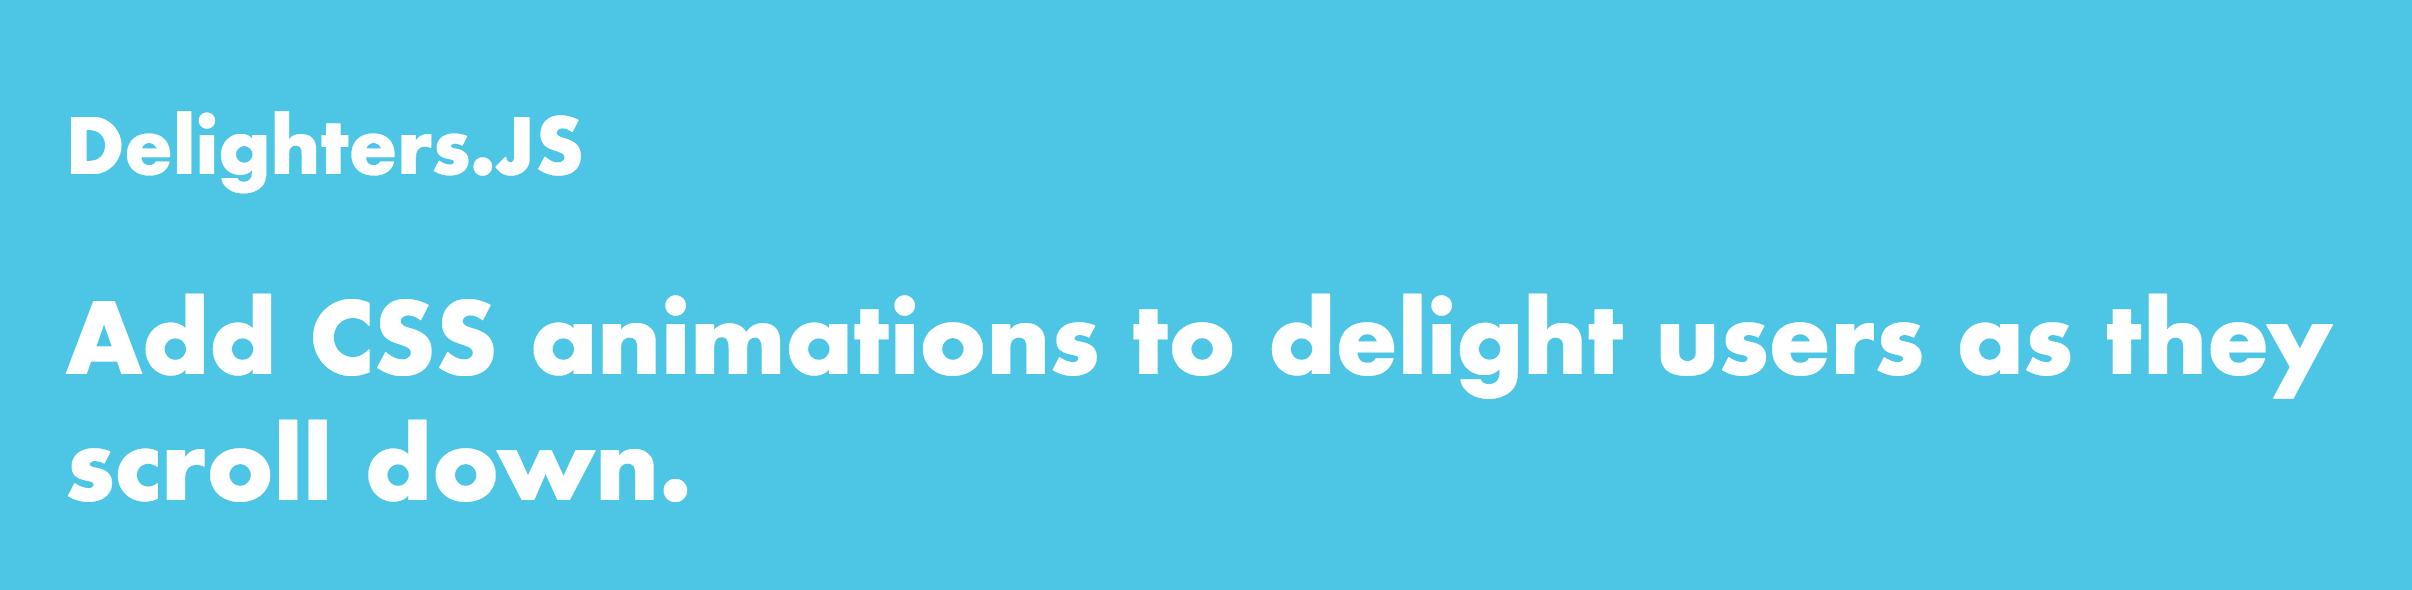 Delighters